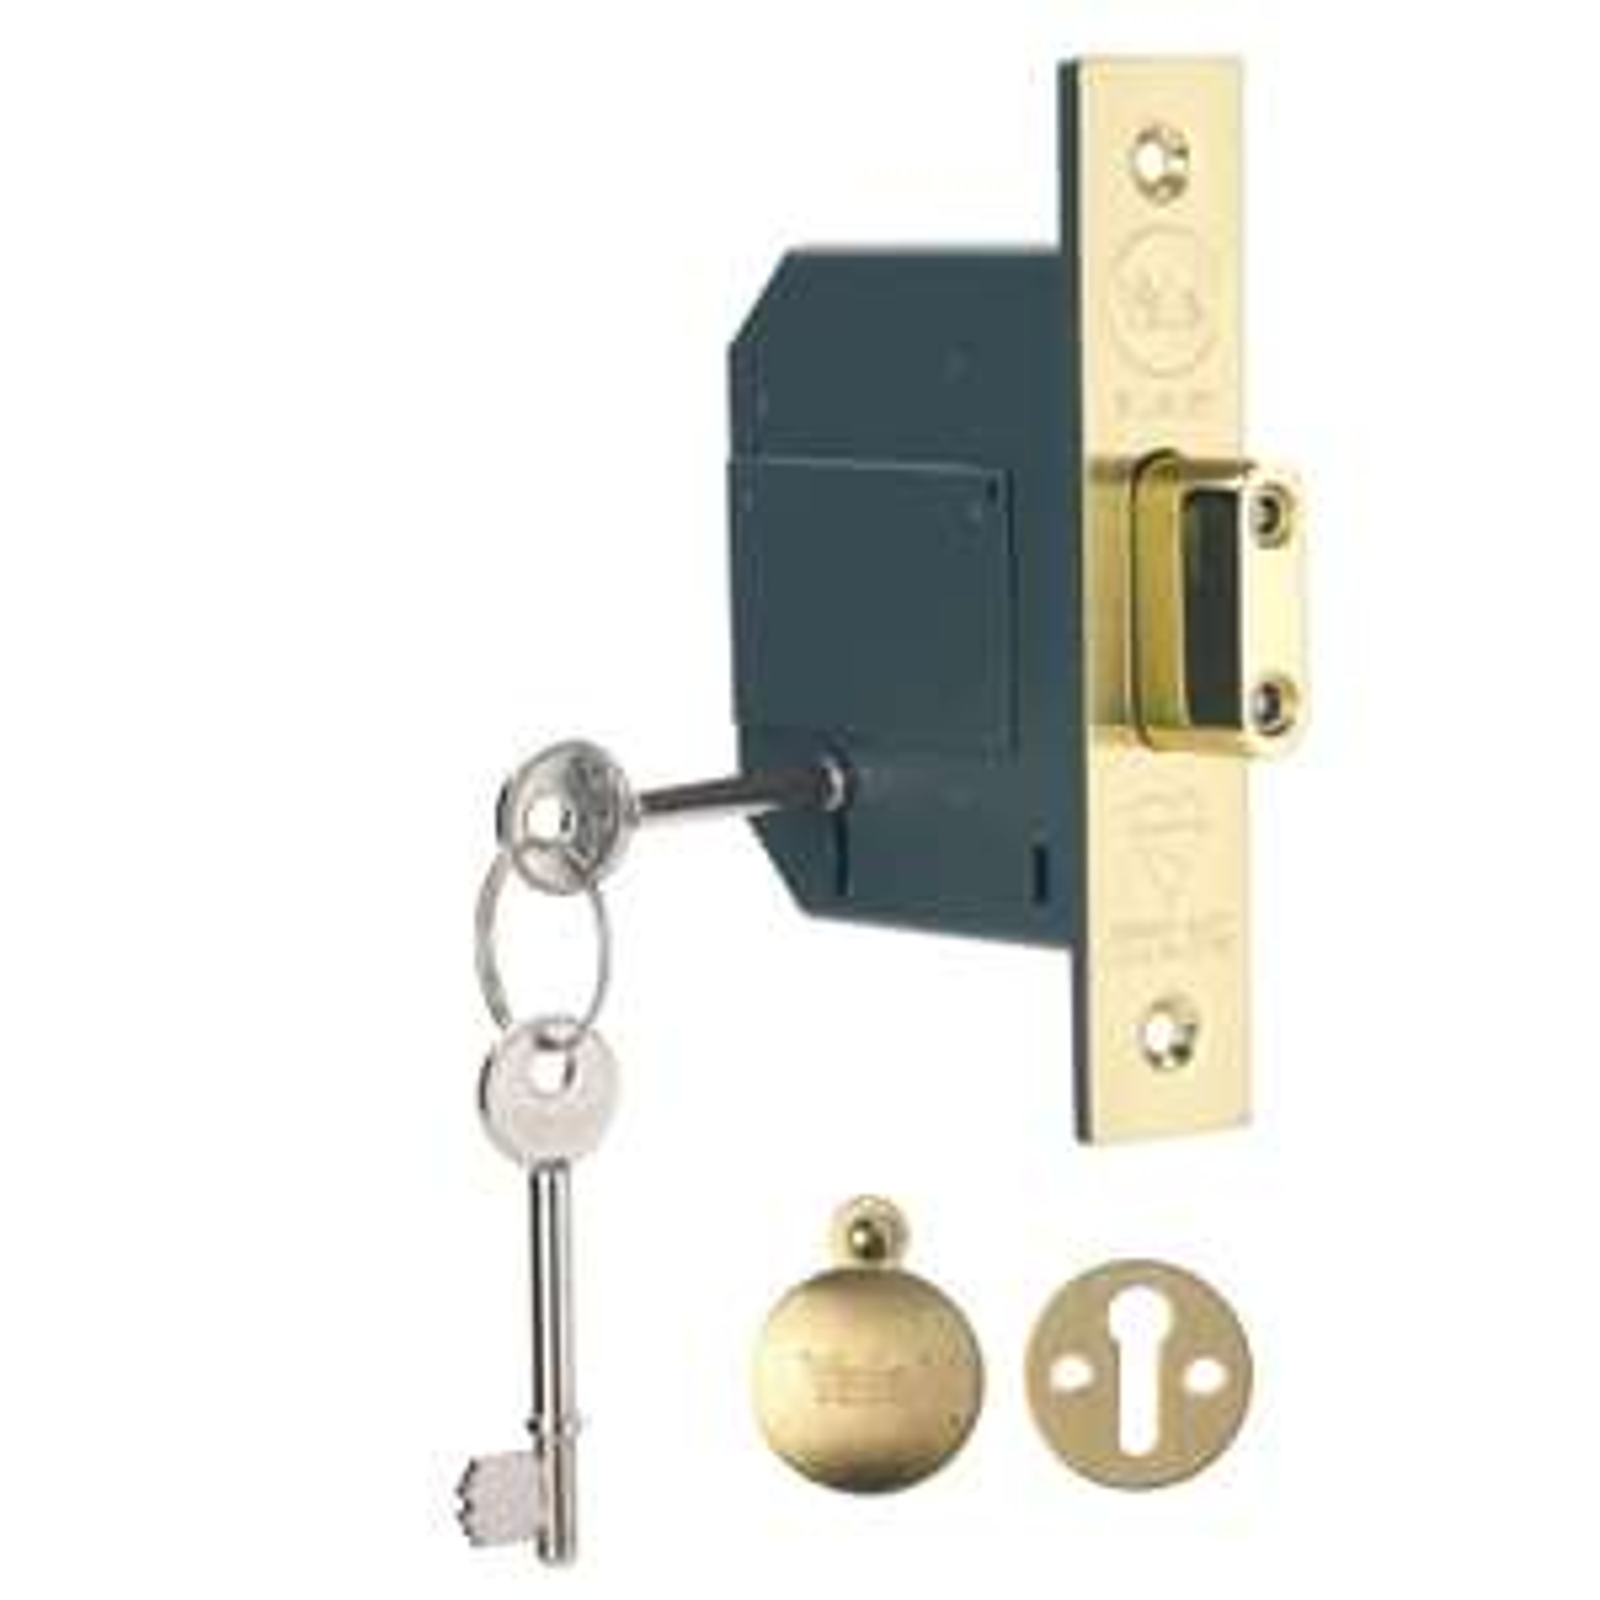 Yale PM562 British Standard BS3621 5 Lever Door Lock , Now £4 ( keyholes,doorknobs,sashlocks,deadlocks ) @ Homebase ( Free Click & Collect )